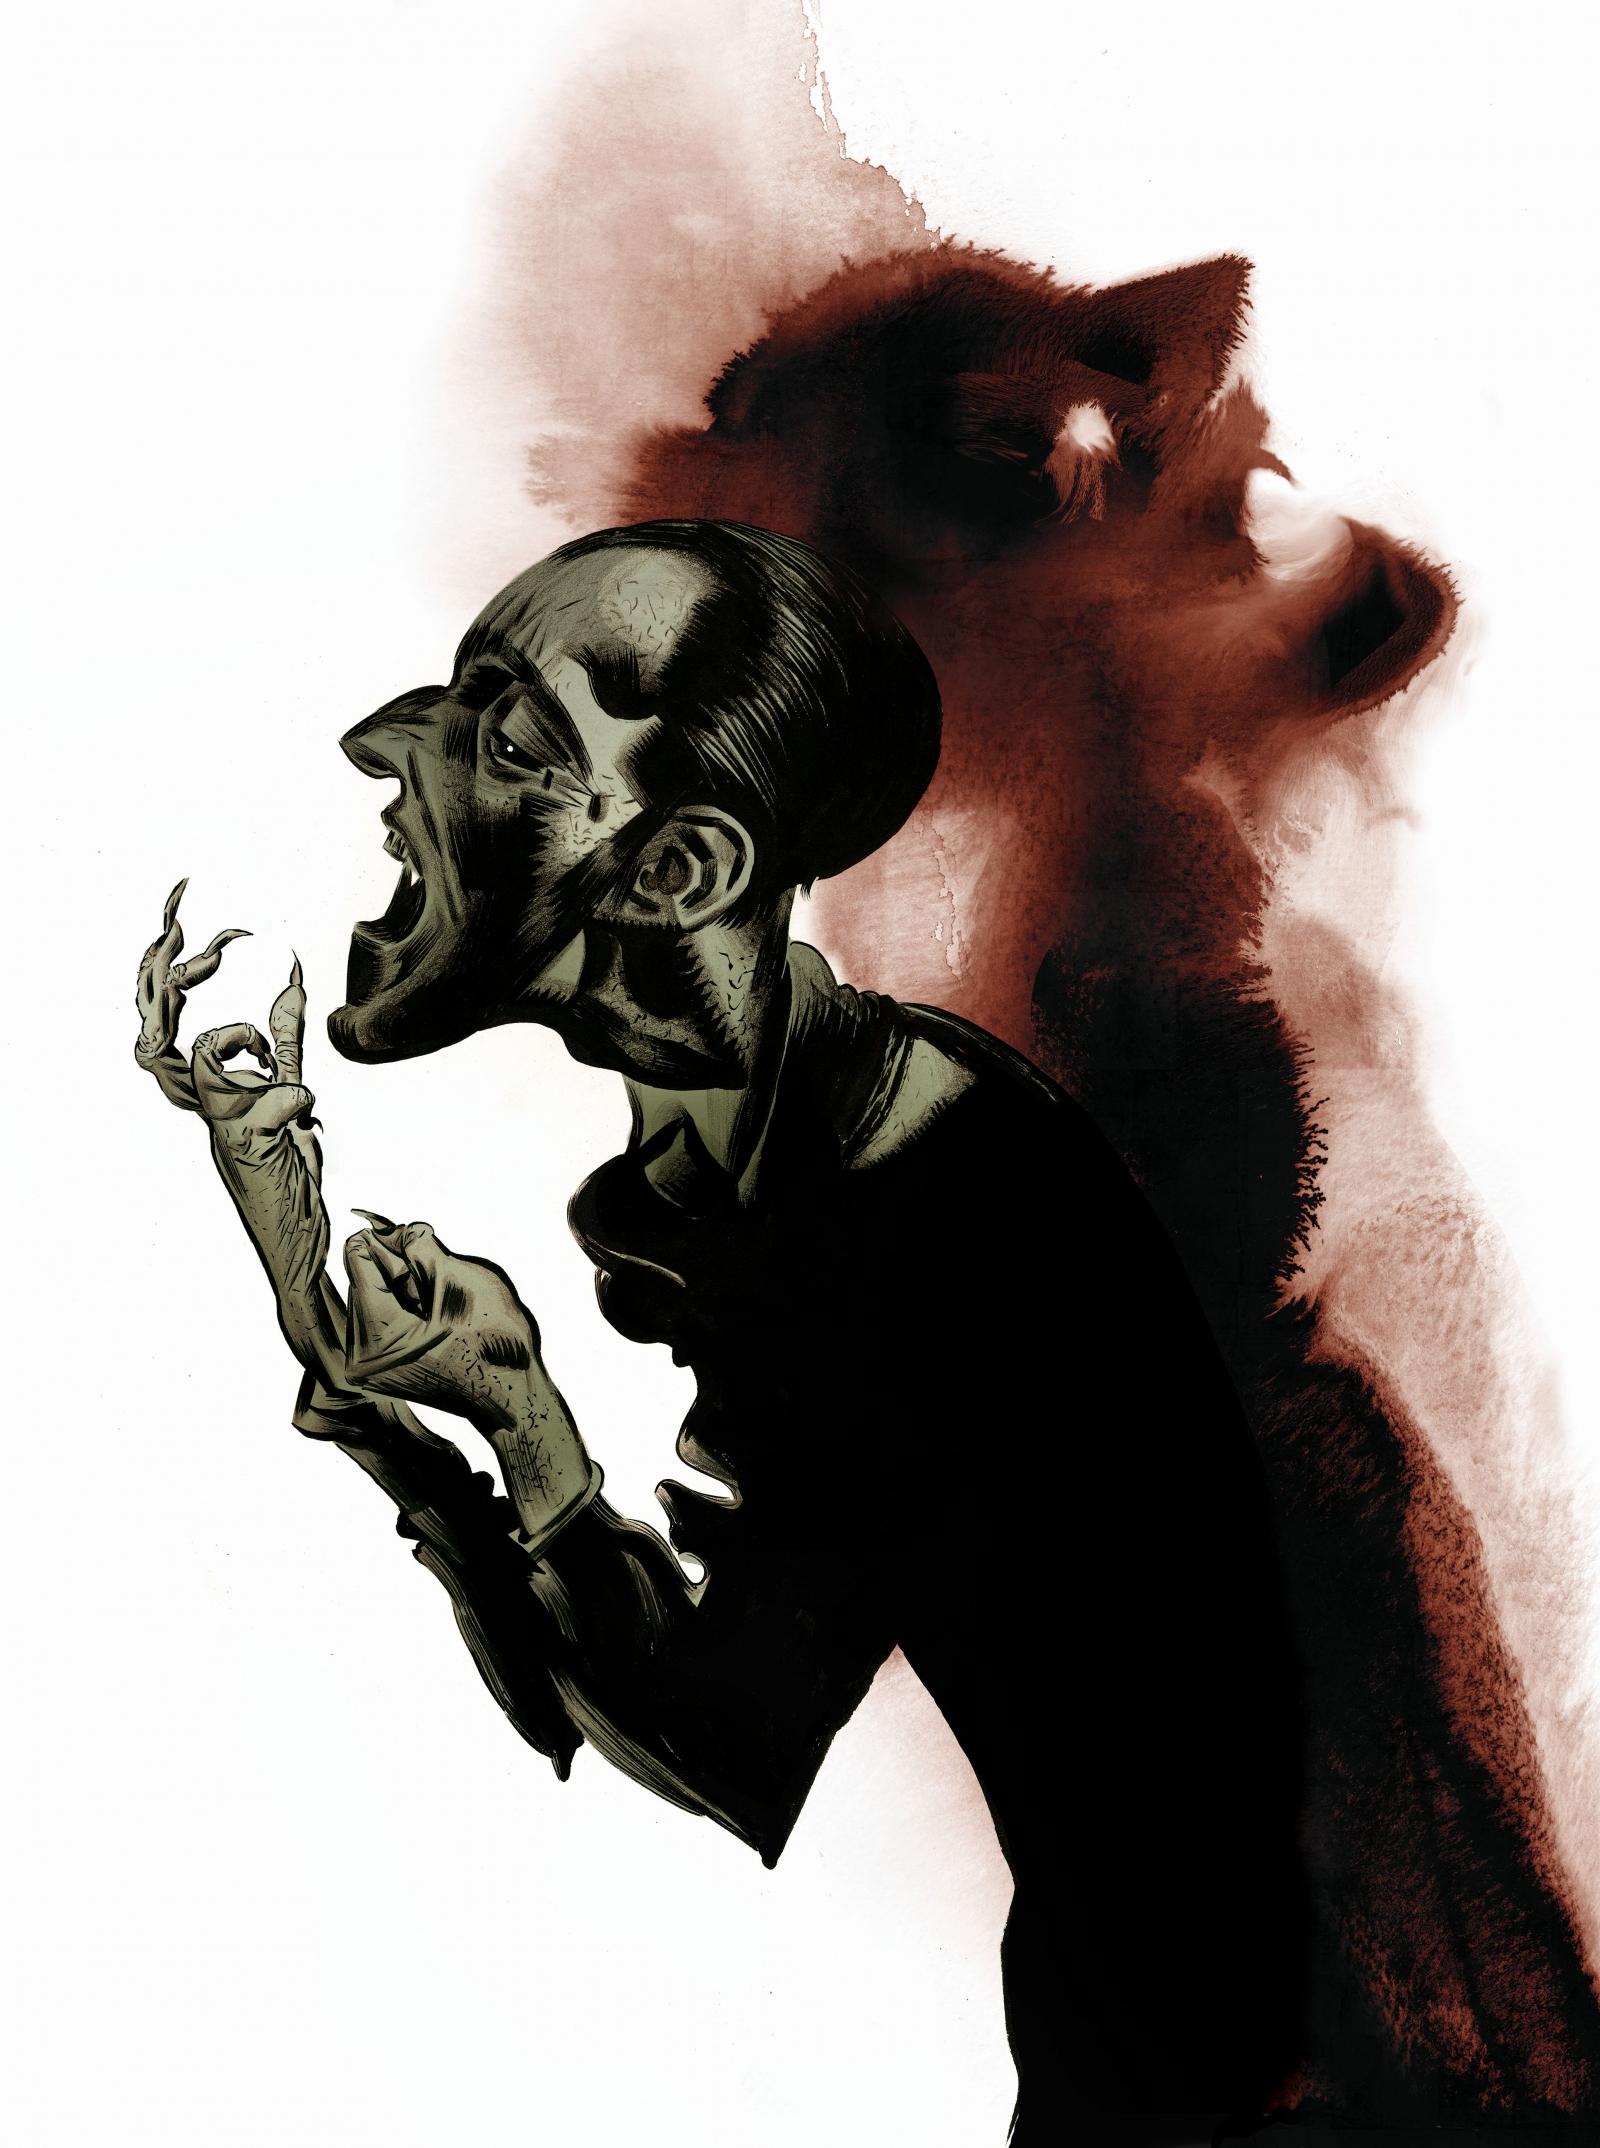 Artist Dave McKean's new artwork for Terror and Wonder: The Gothic Imagination